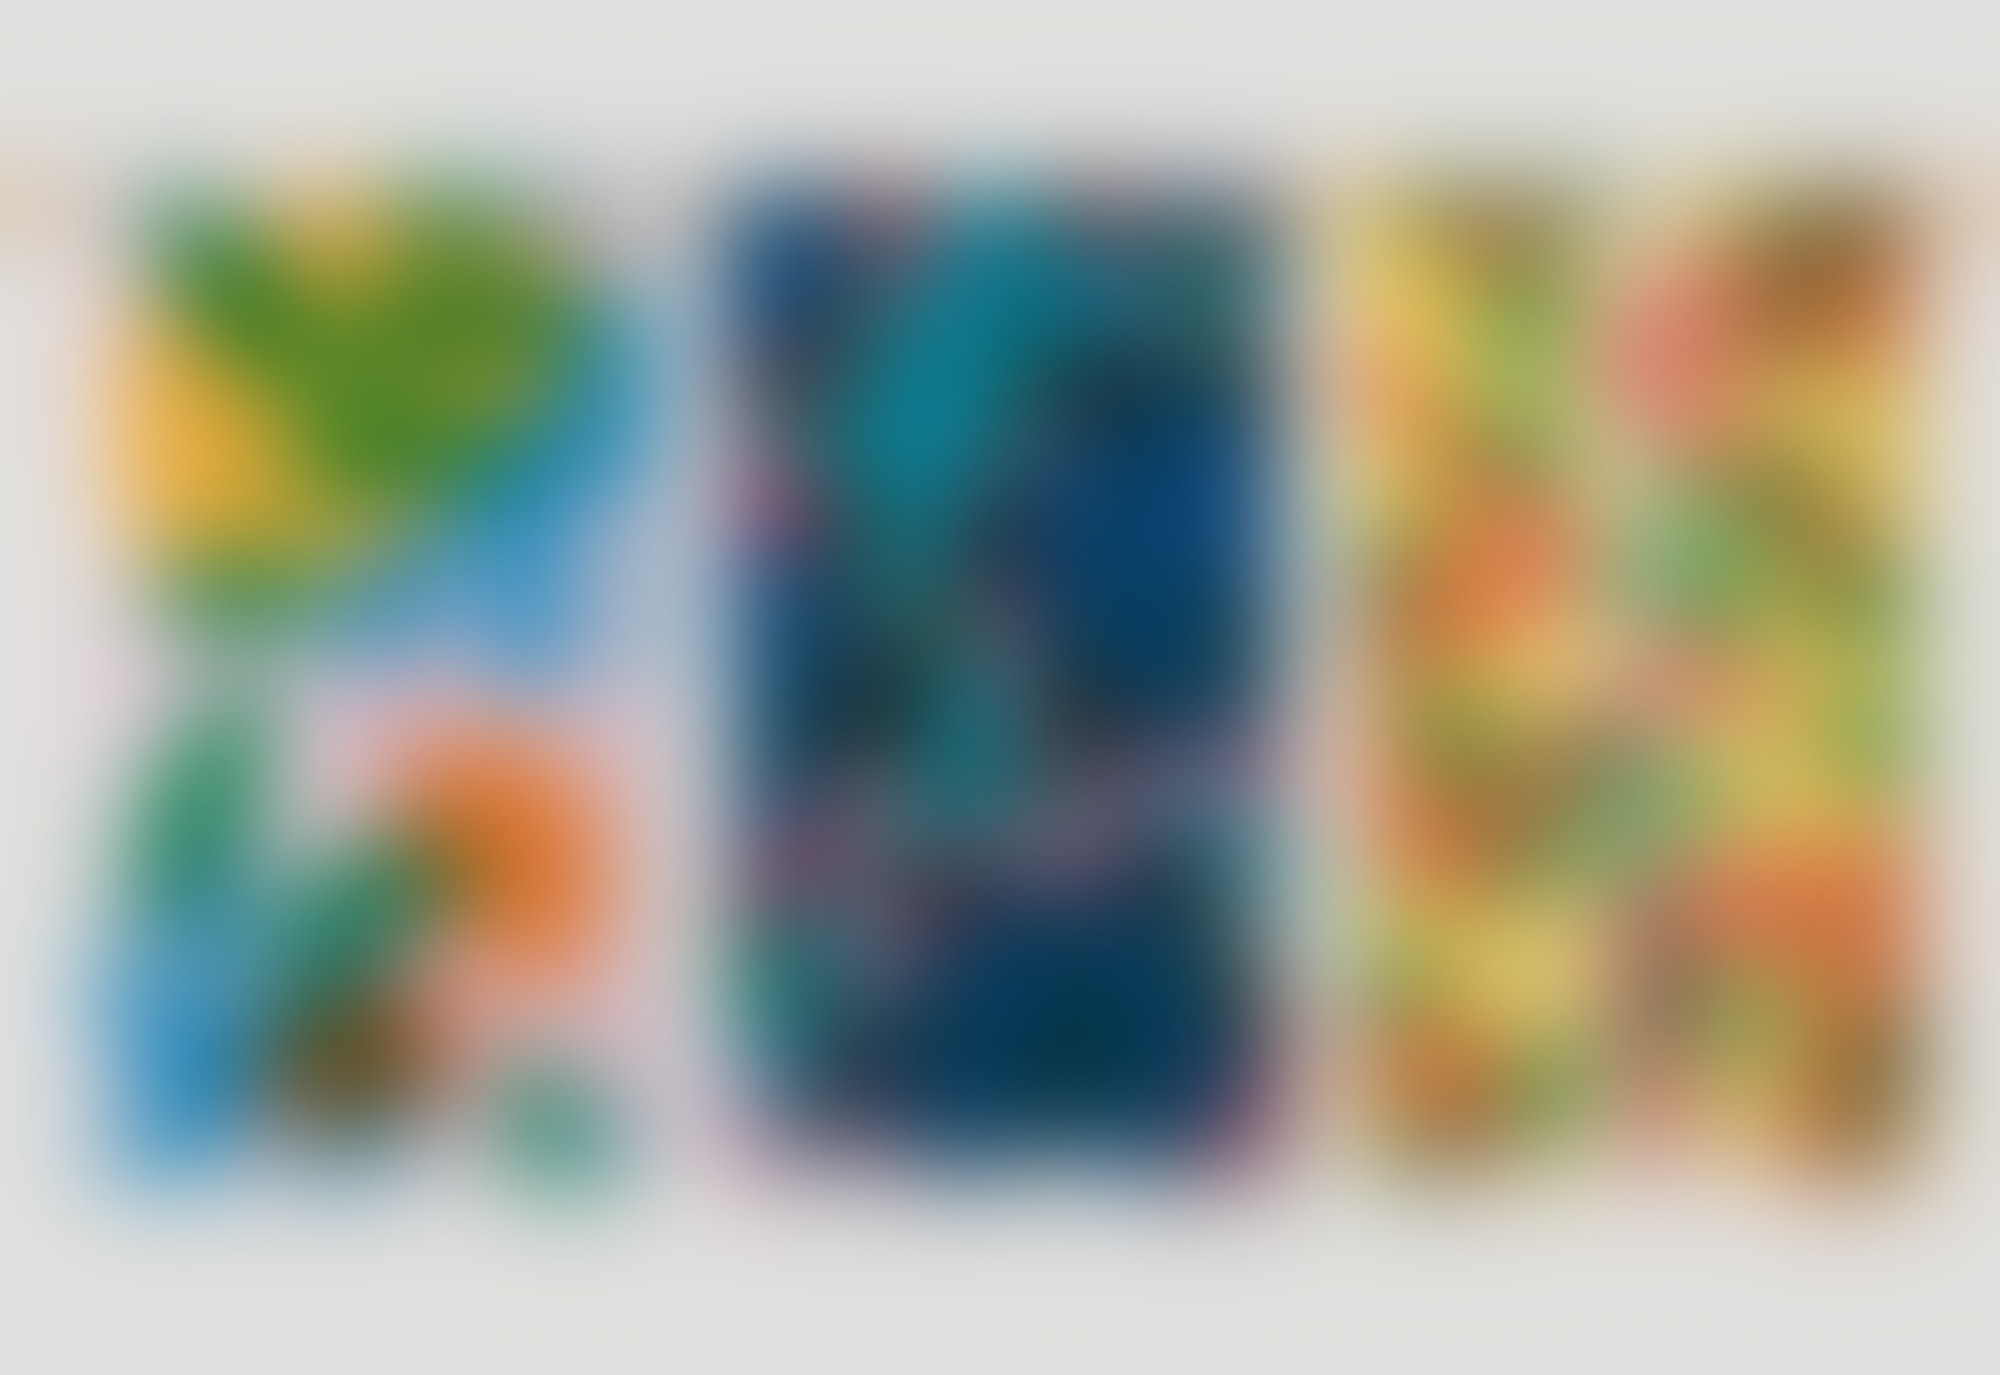 RISOTTO Beach Towels 2016 autocompressfitresizeixlibphp 1 1 0max h2000max w3 D2000q80sf03cab16605e899573871a61ddd82ccb